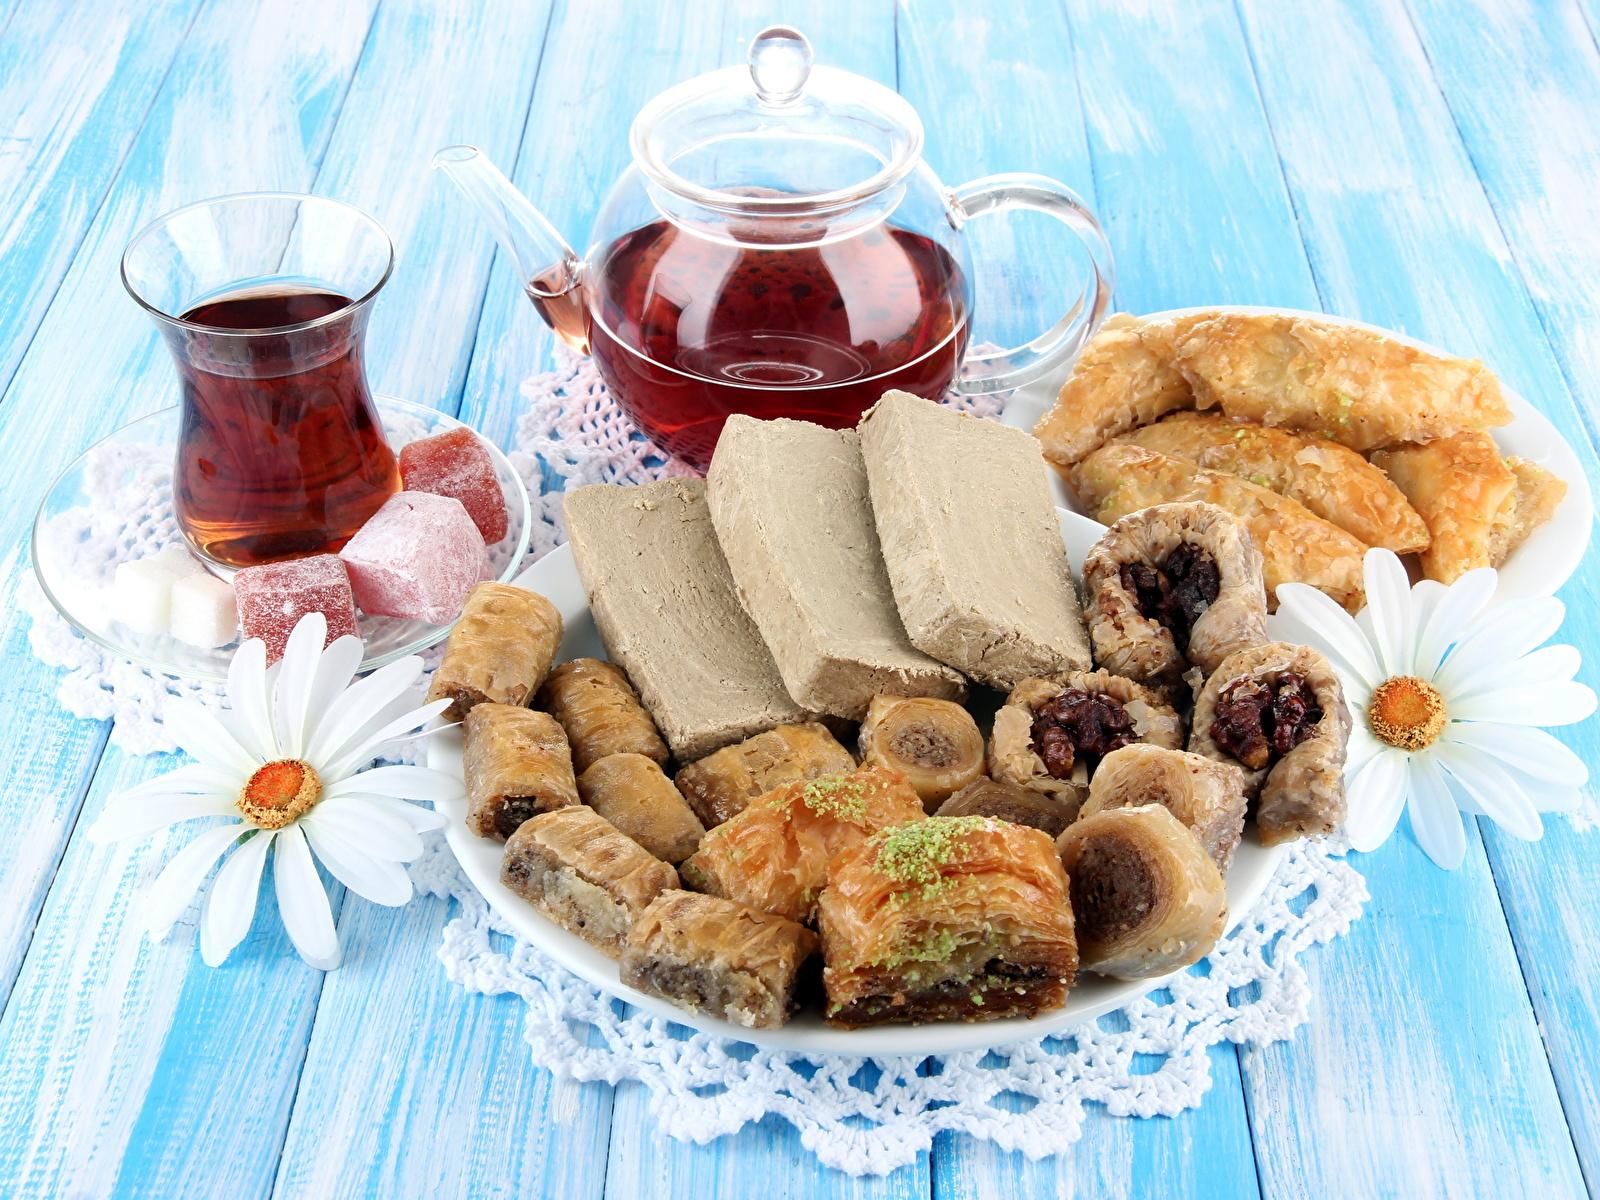 чай с булочками